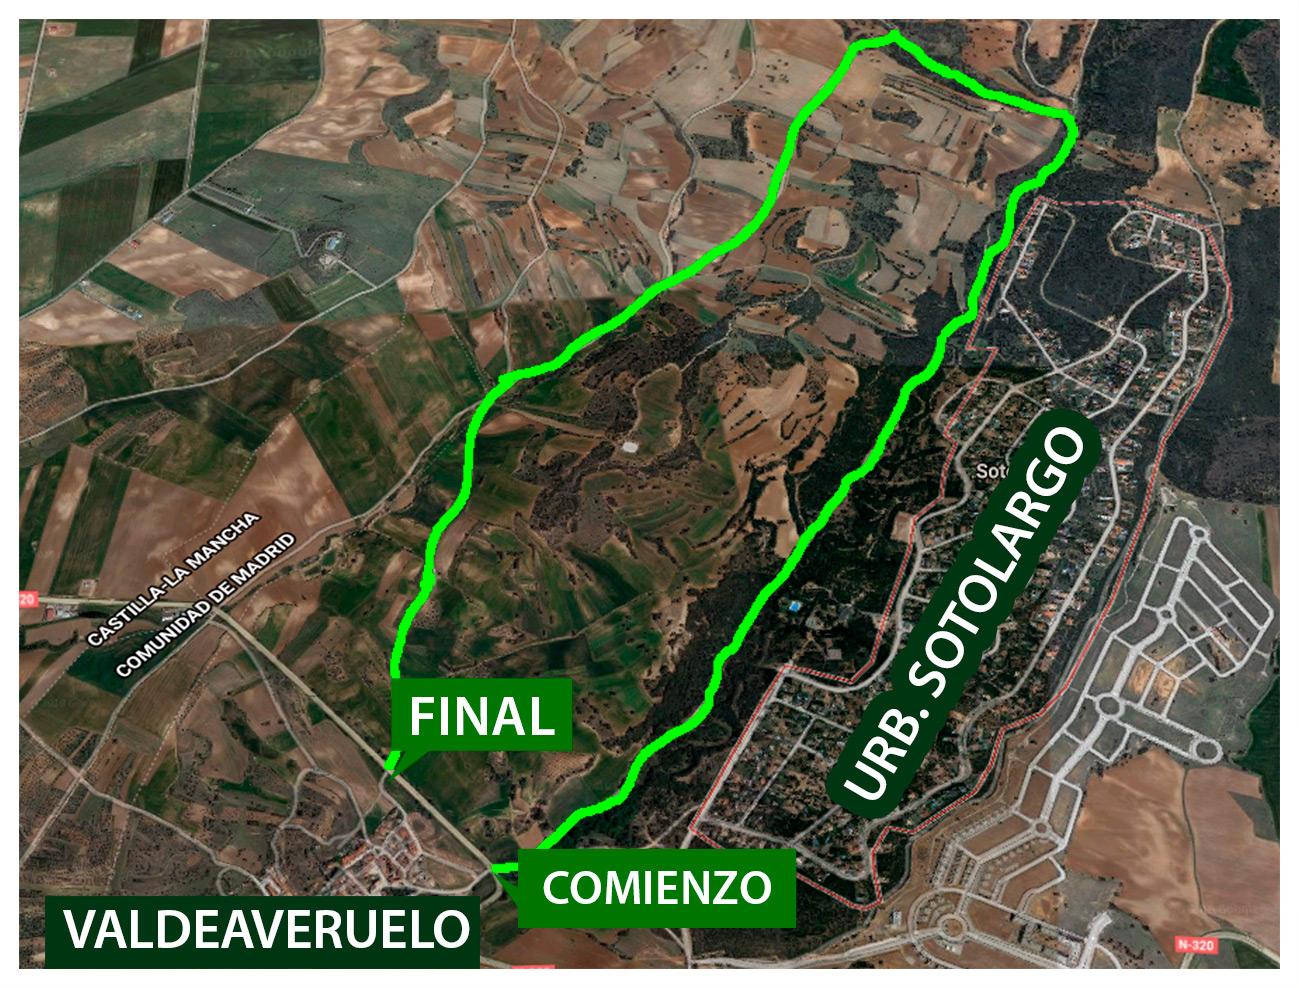 Ruta Valdeaveruelo Sotolargo